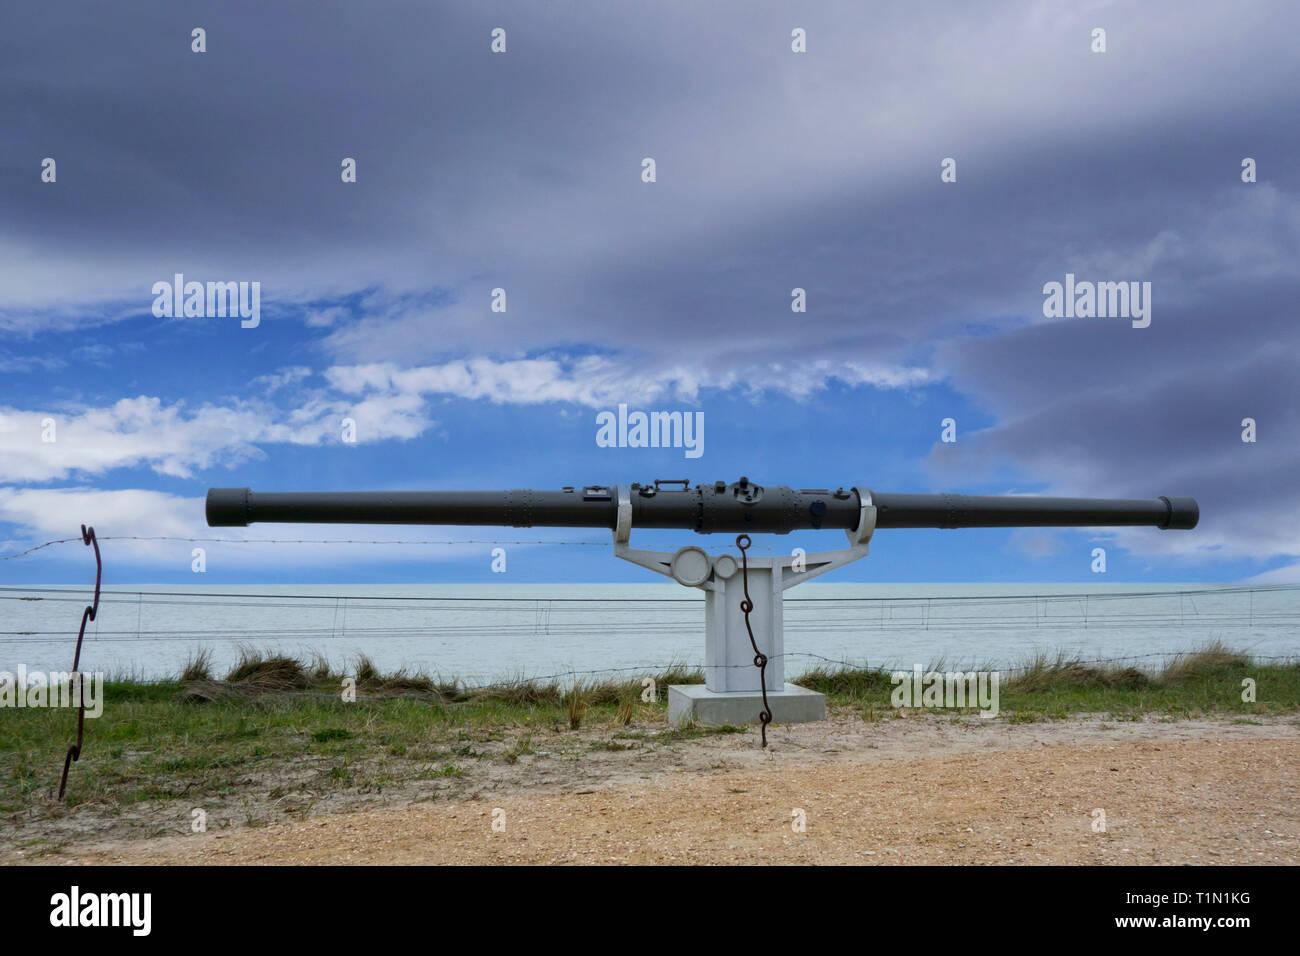 German coincidence rangefinder / stereoscopic rangefinder/ parallax rangefinder / split-image rangefinder along the North Sea coast, Raversijde - Stock Image